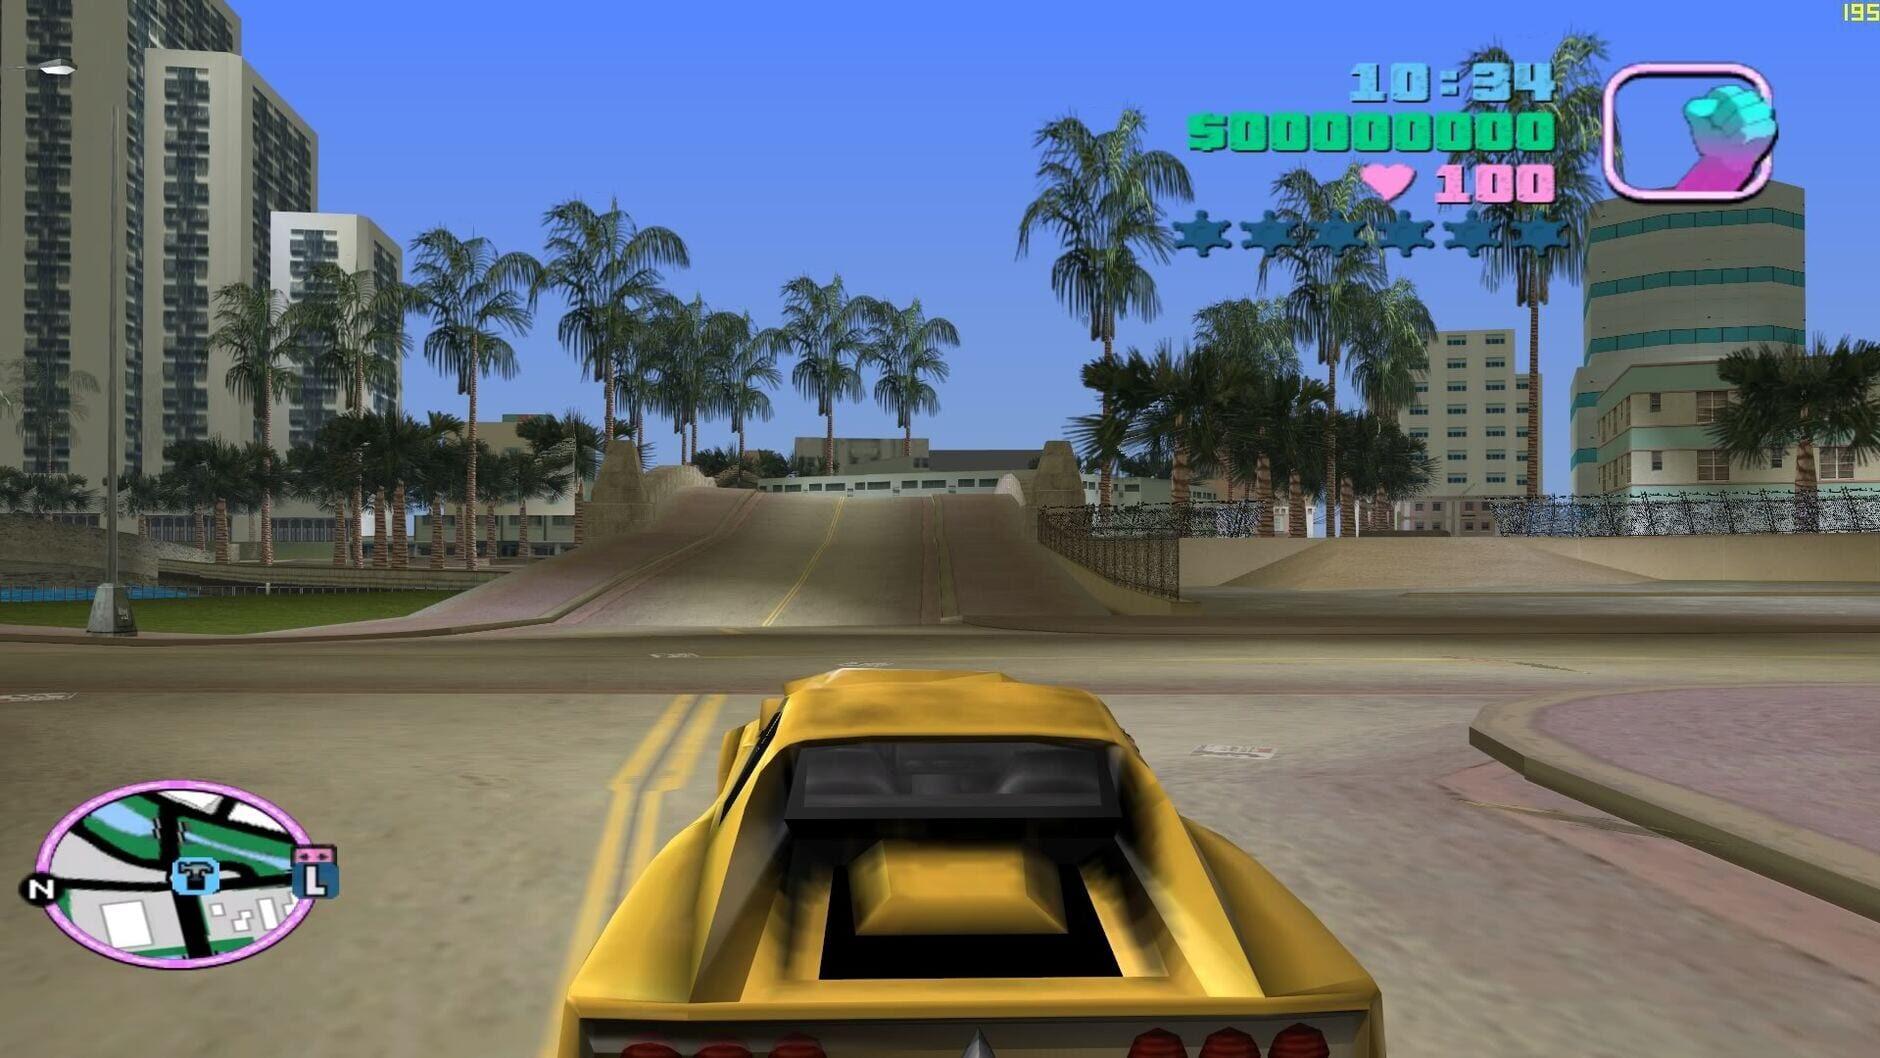 Grand Theft Auto: Vice City - 4